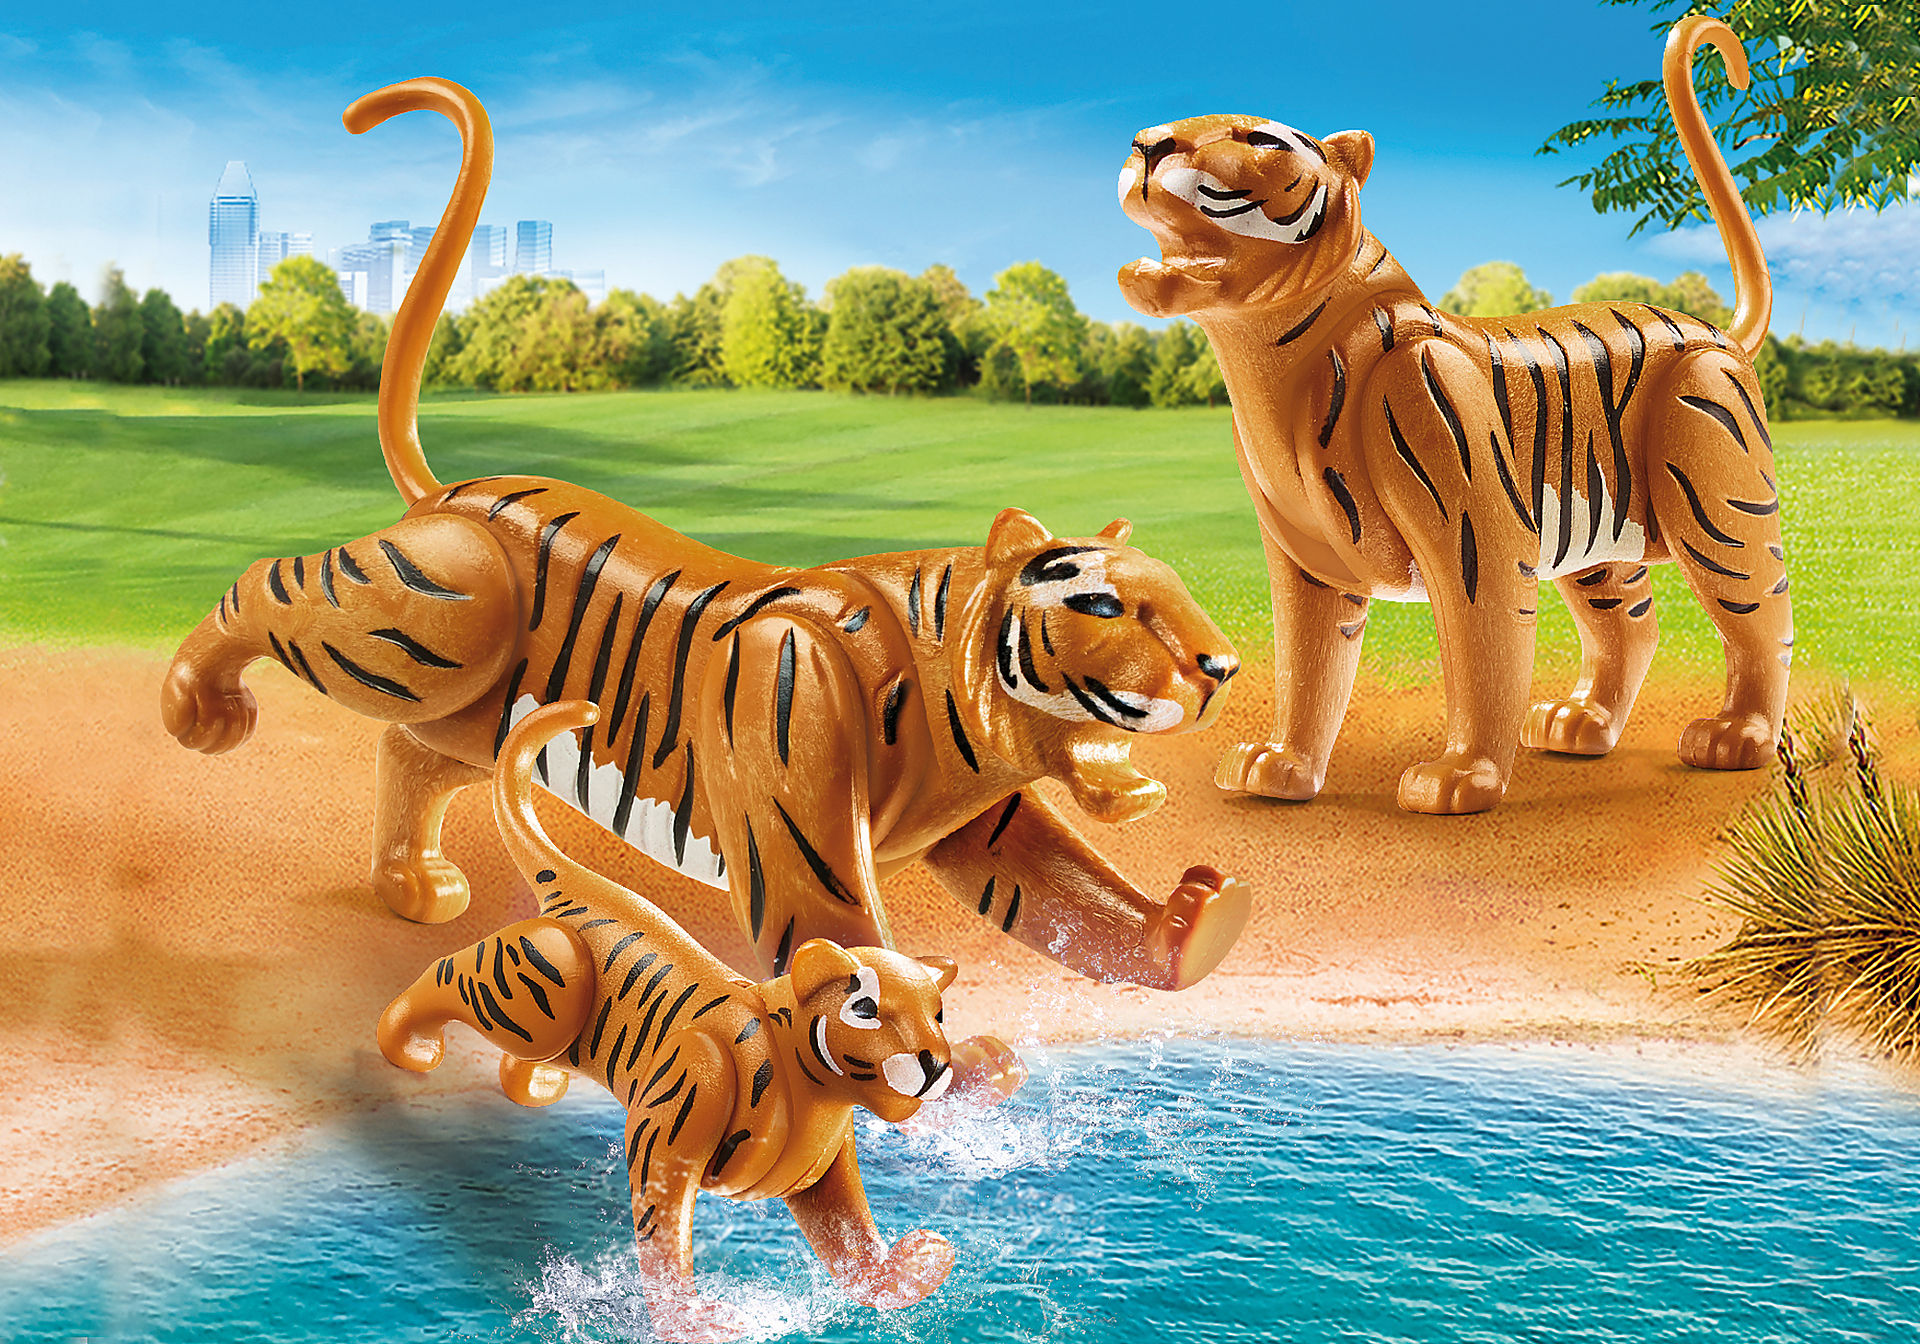 70359 Tigers (Bag) zoom image1